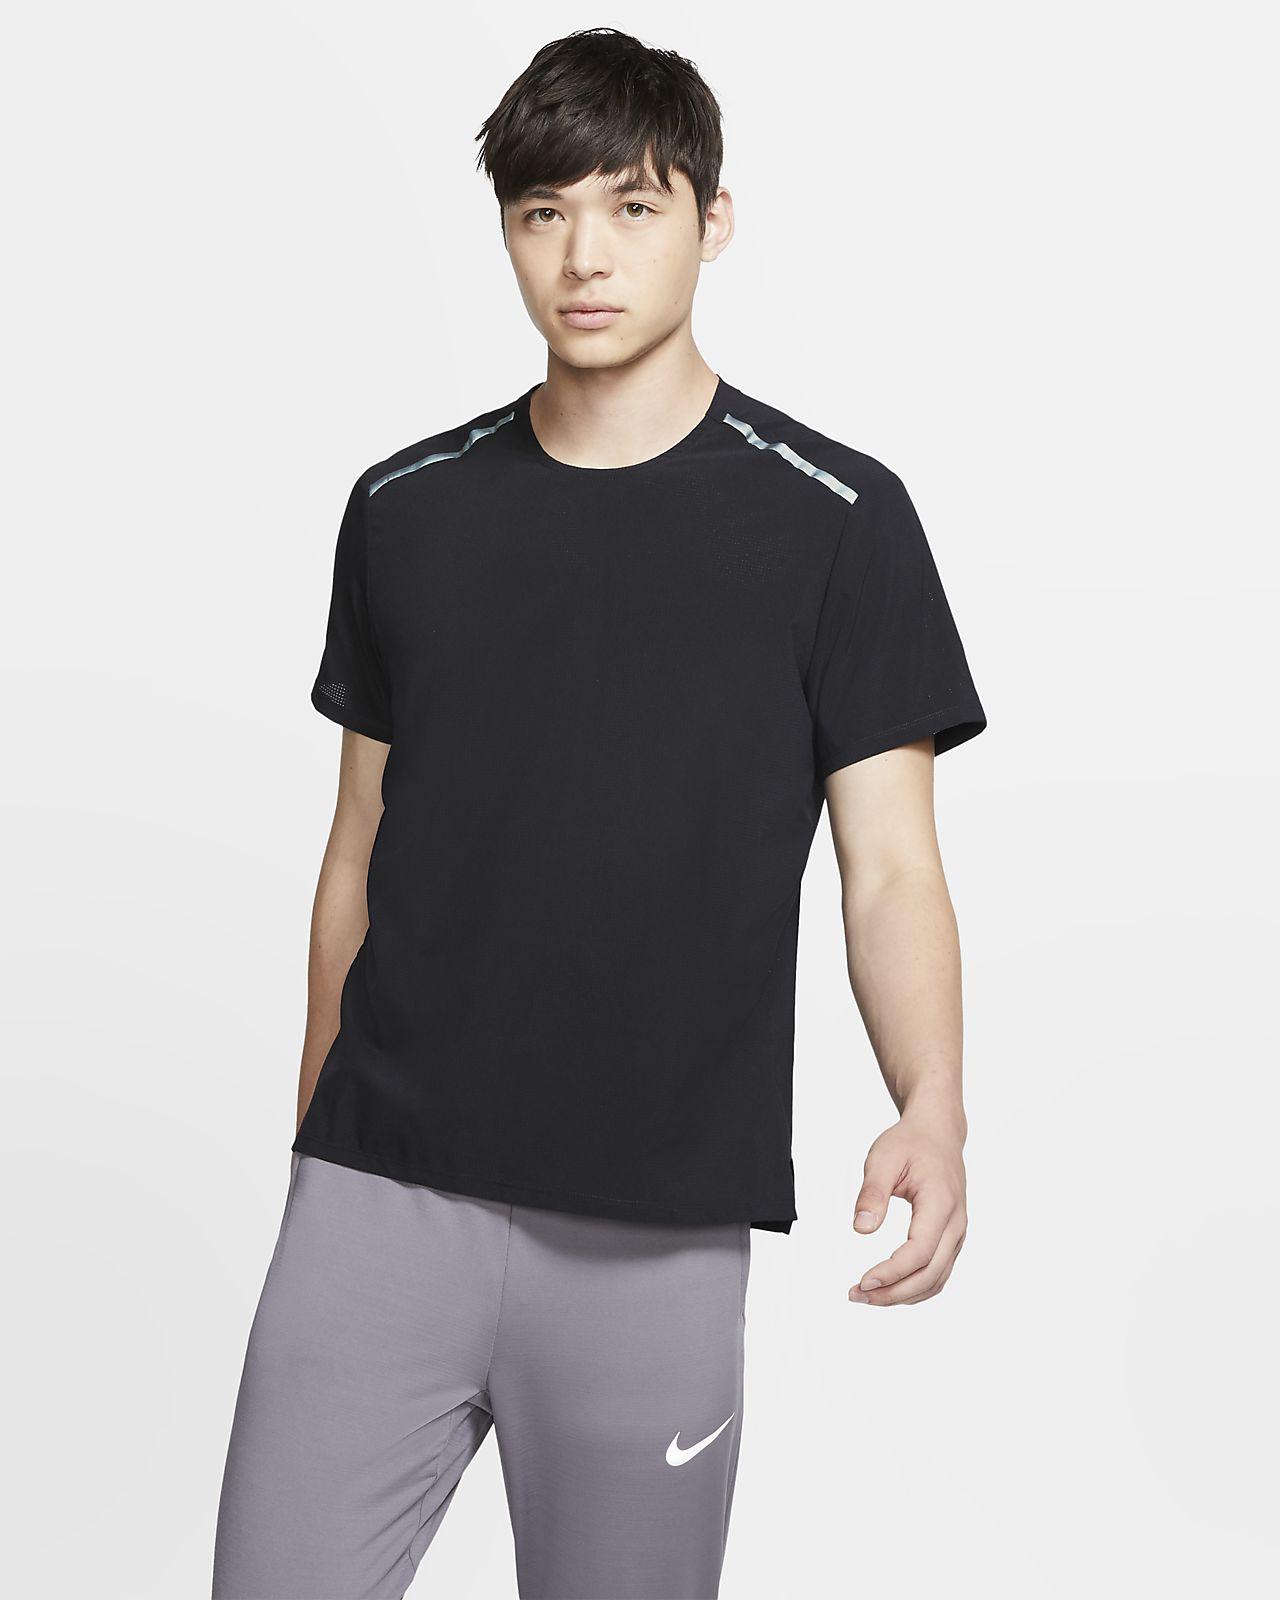 Nike Kısa Kollu Erkek Koşu Üstü